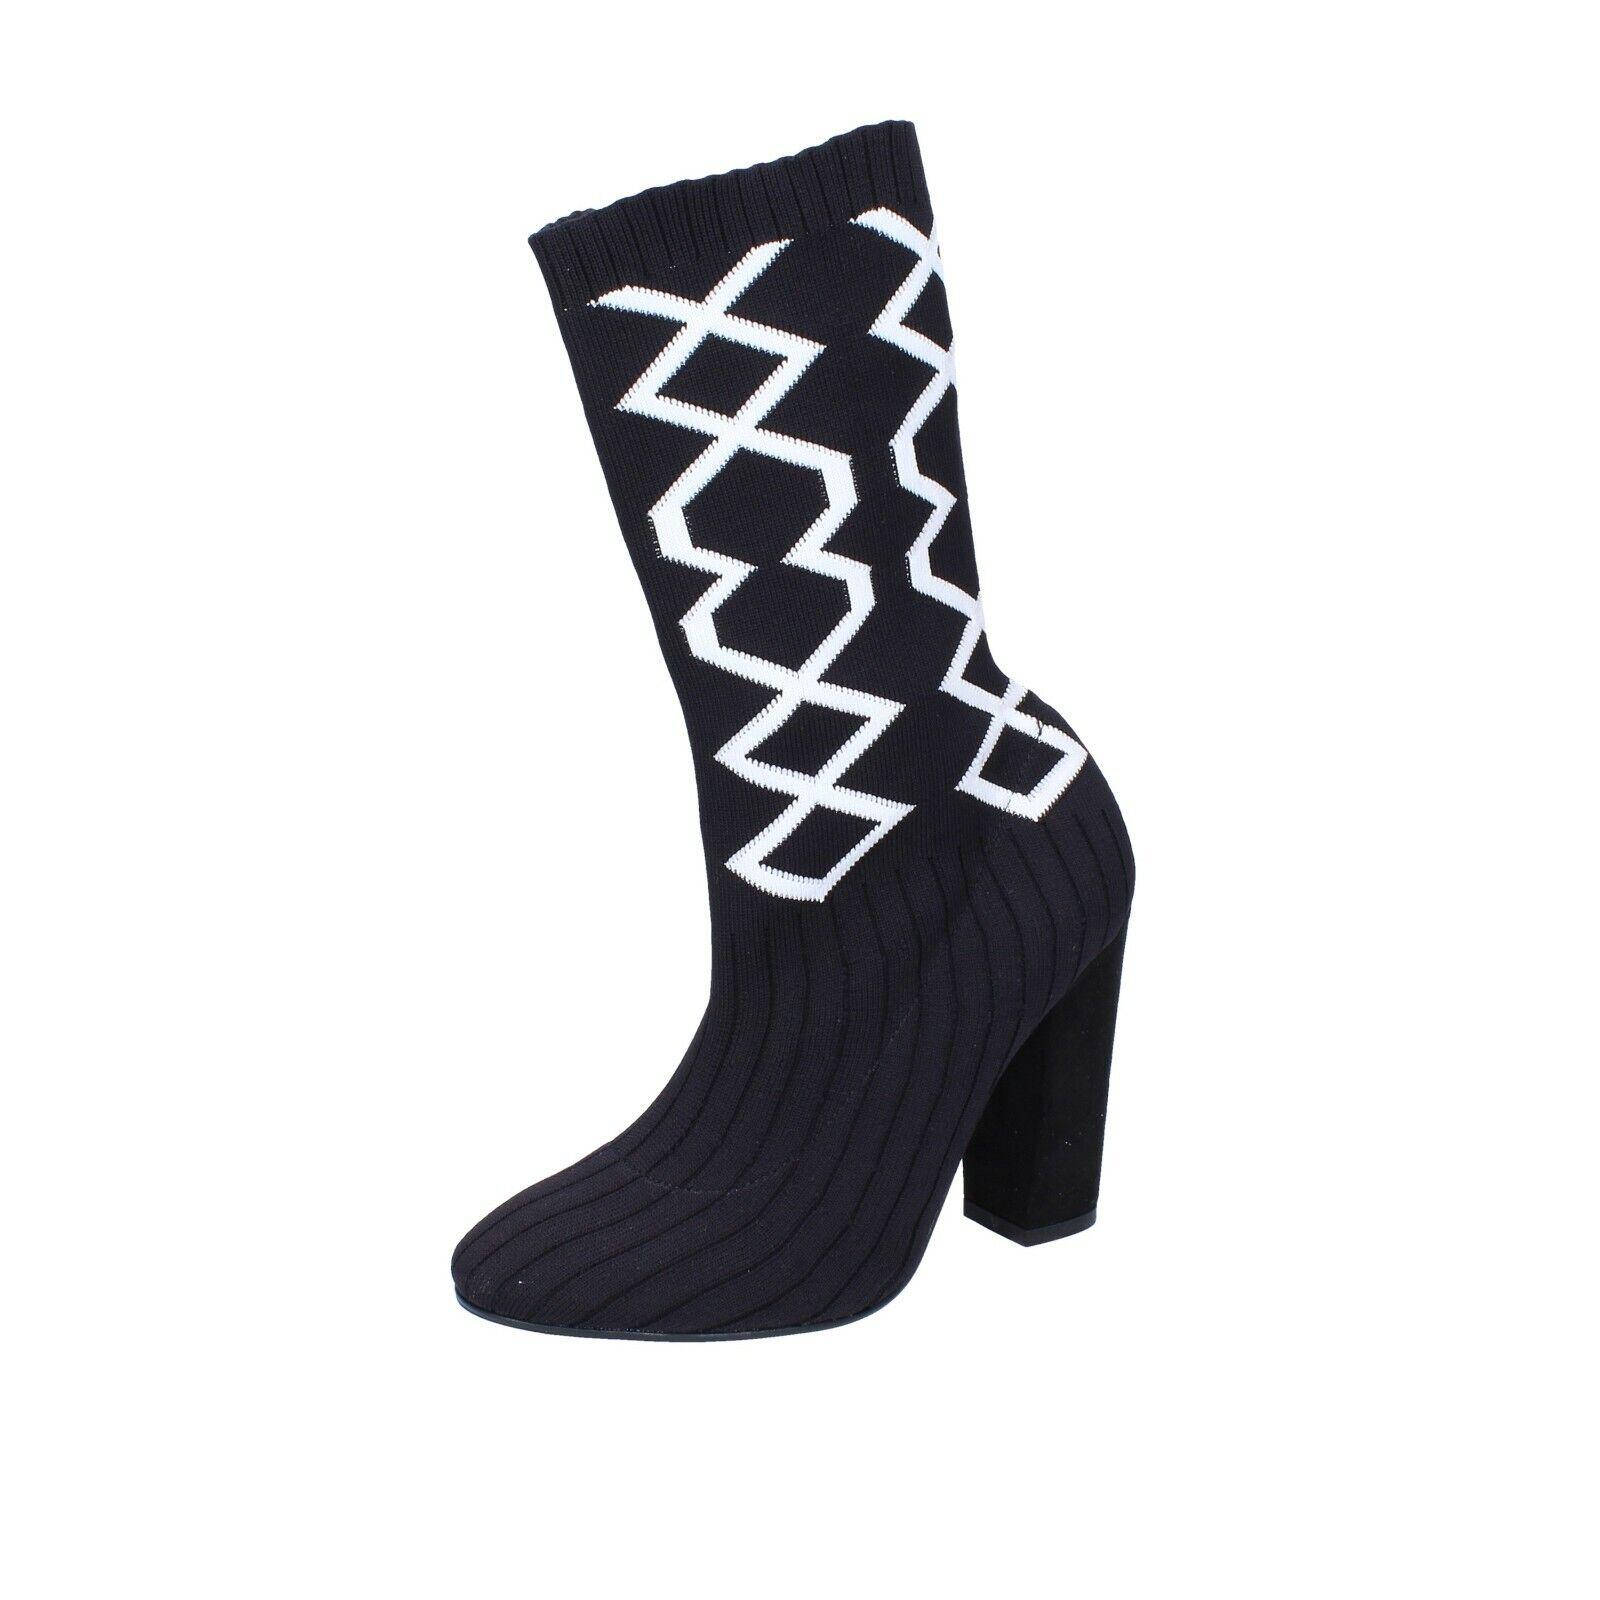 Chaussures femmes NACREE 39 UE Bottines noir blanc Textile br272-39